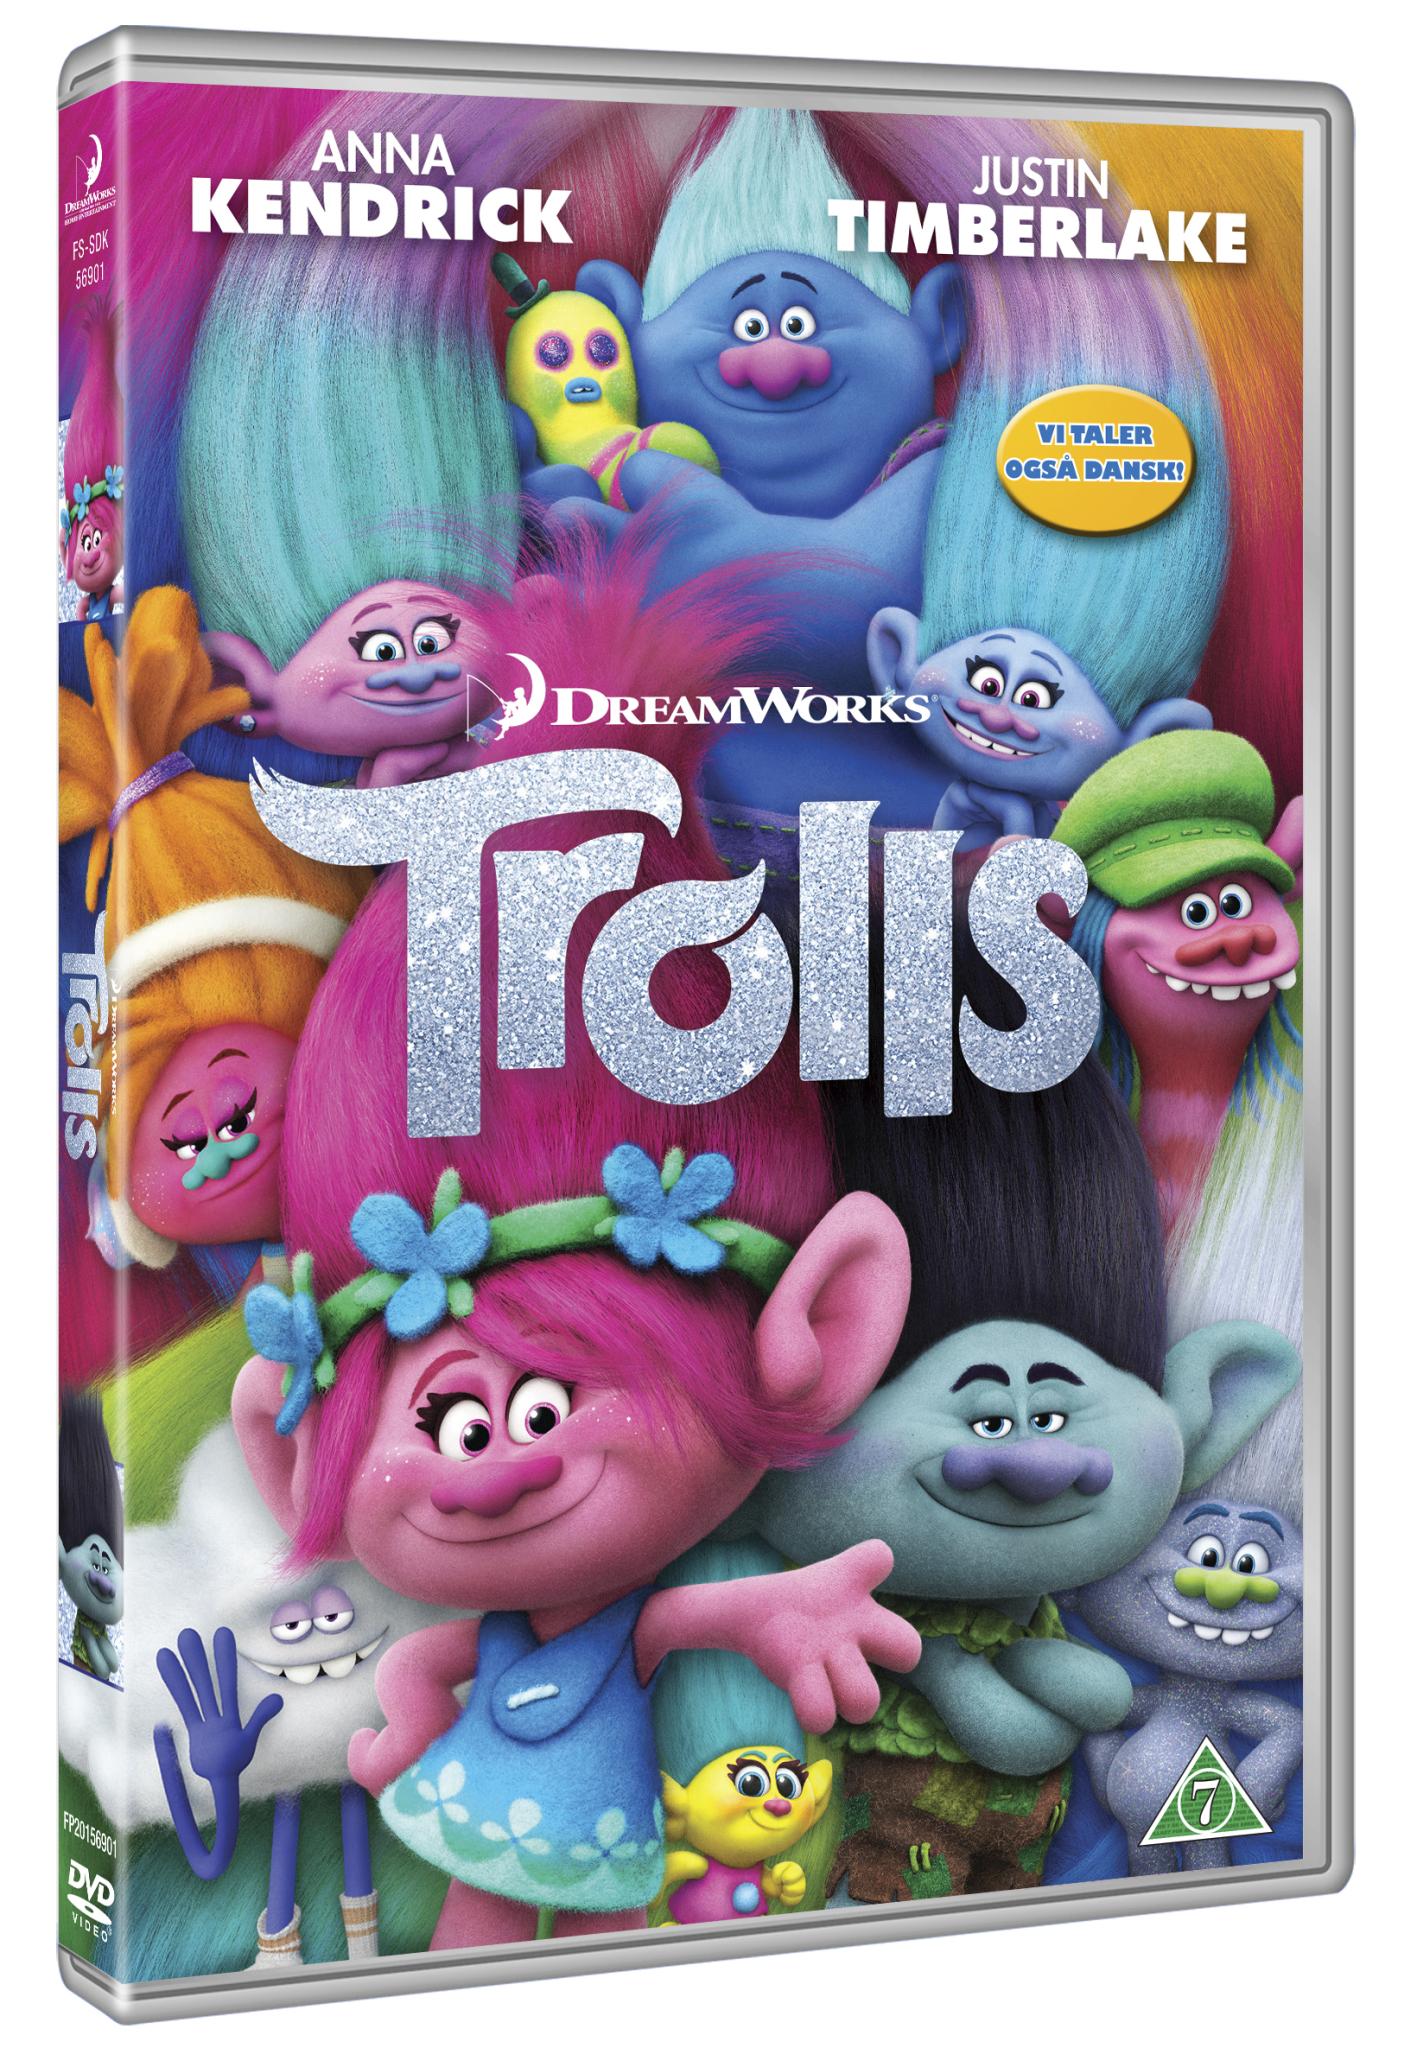 Buy Trolls Dvd Standard Dvd Incl Shipping